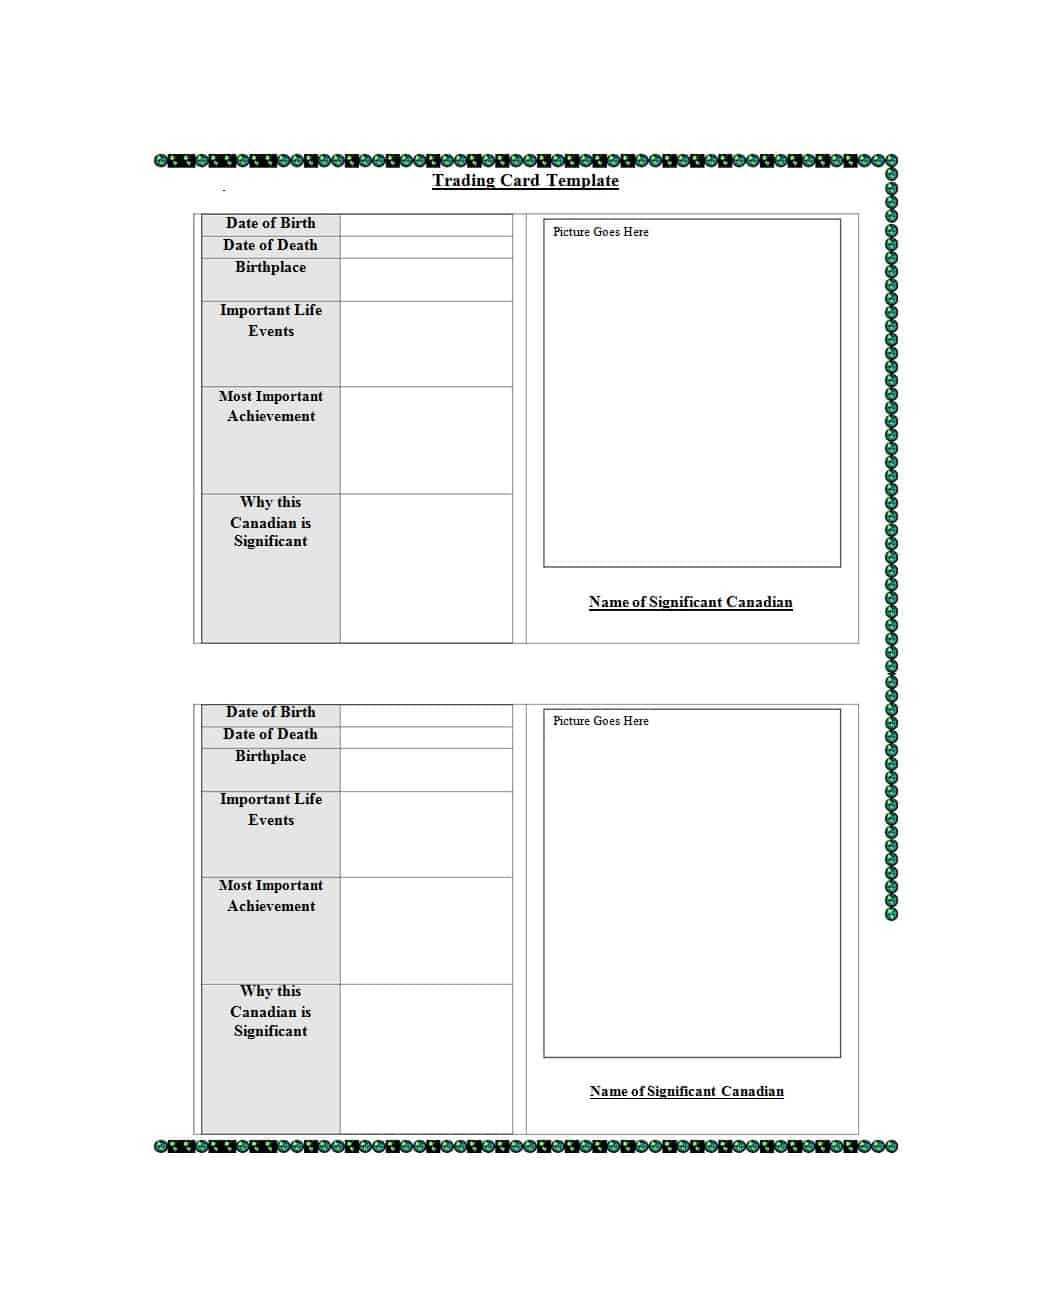 33 Free Trading Card Templates (Baseball, Football, Etc With Trading Card Template Word